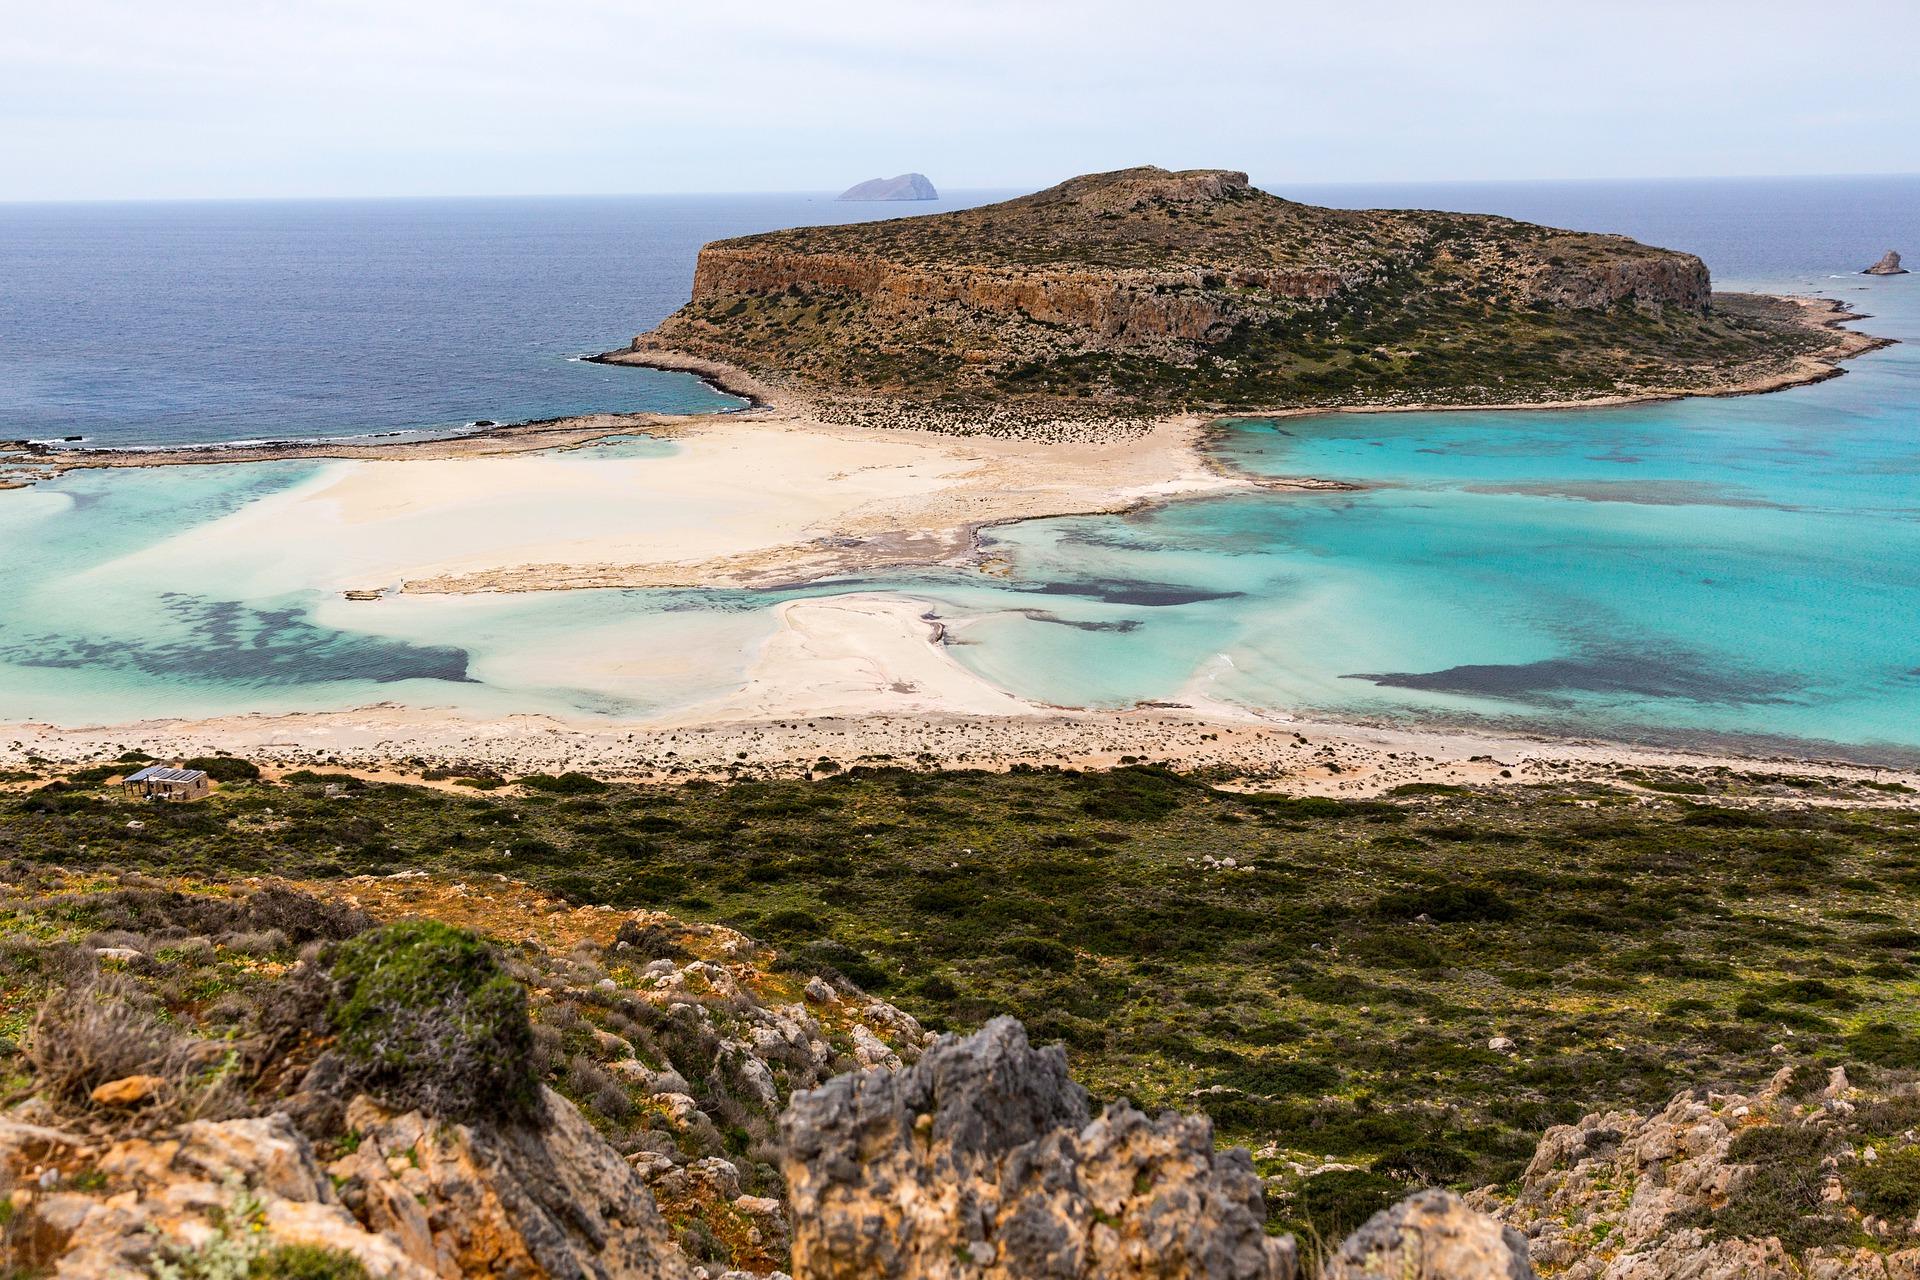 balos beach lagon